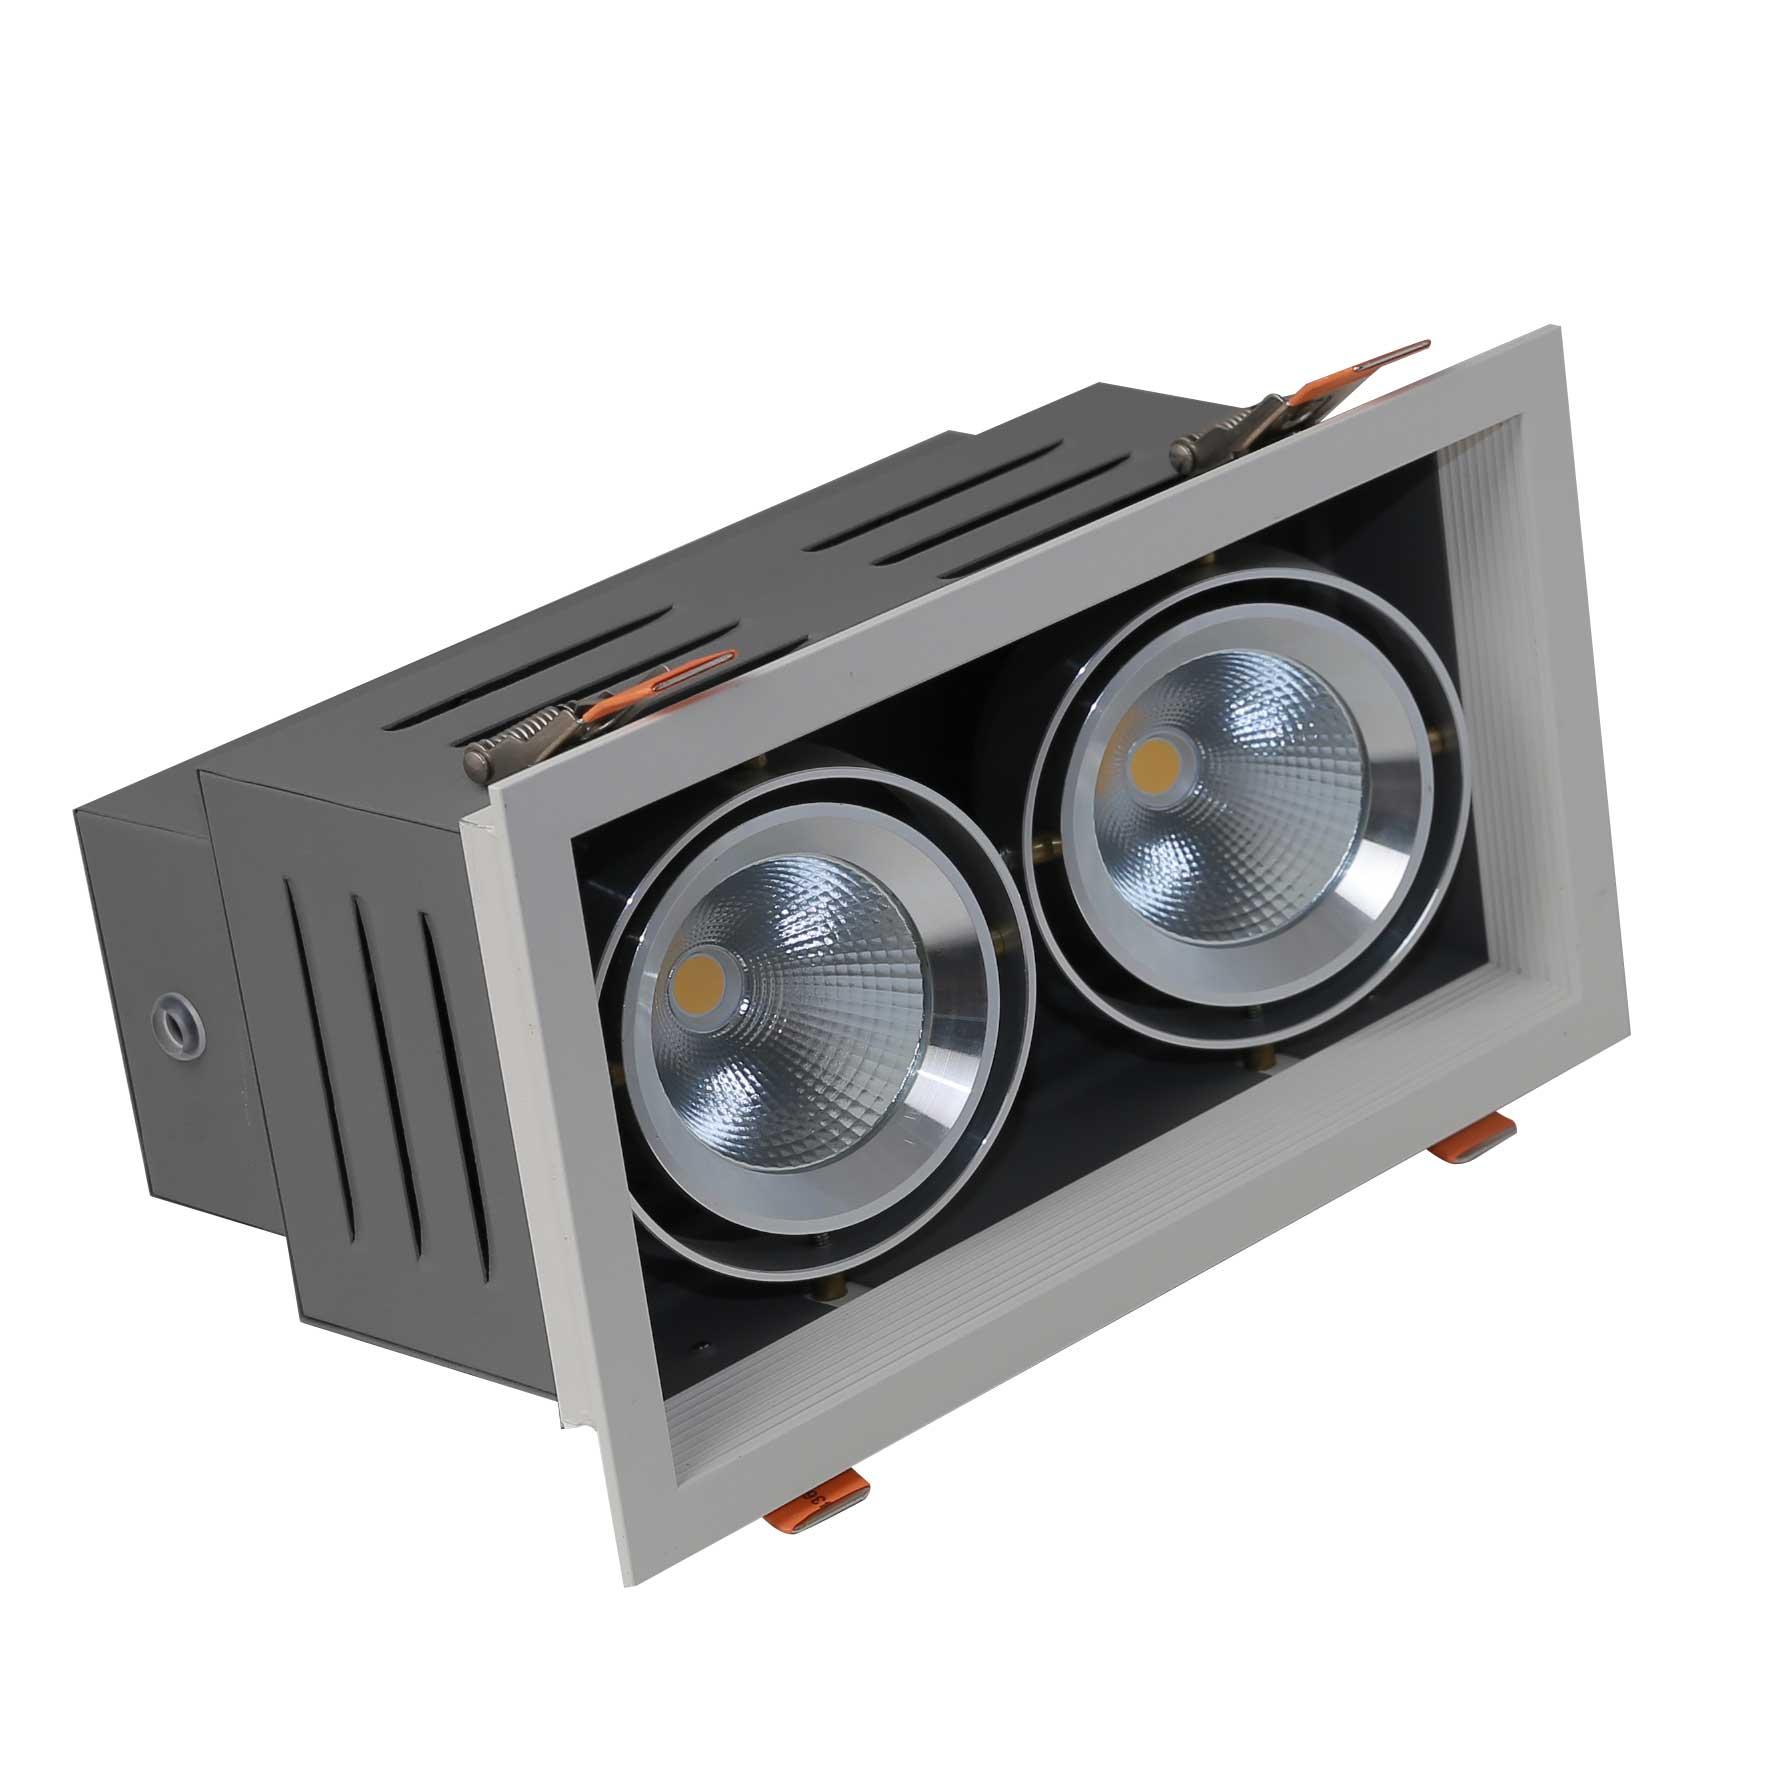 Đèn LED downlight D AT12L 240x125/9wx2.DA-4000K